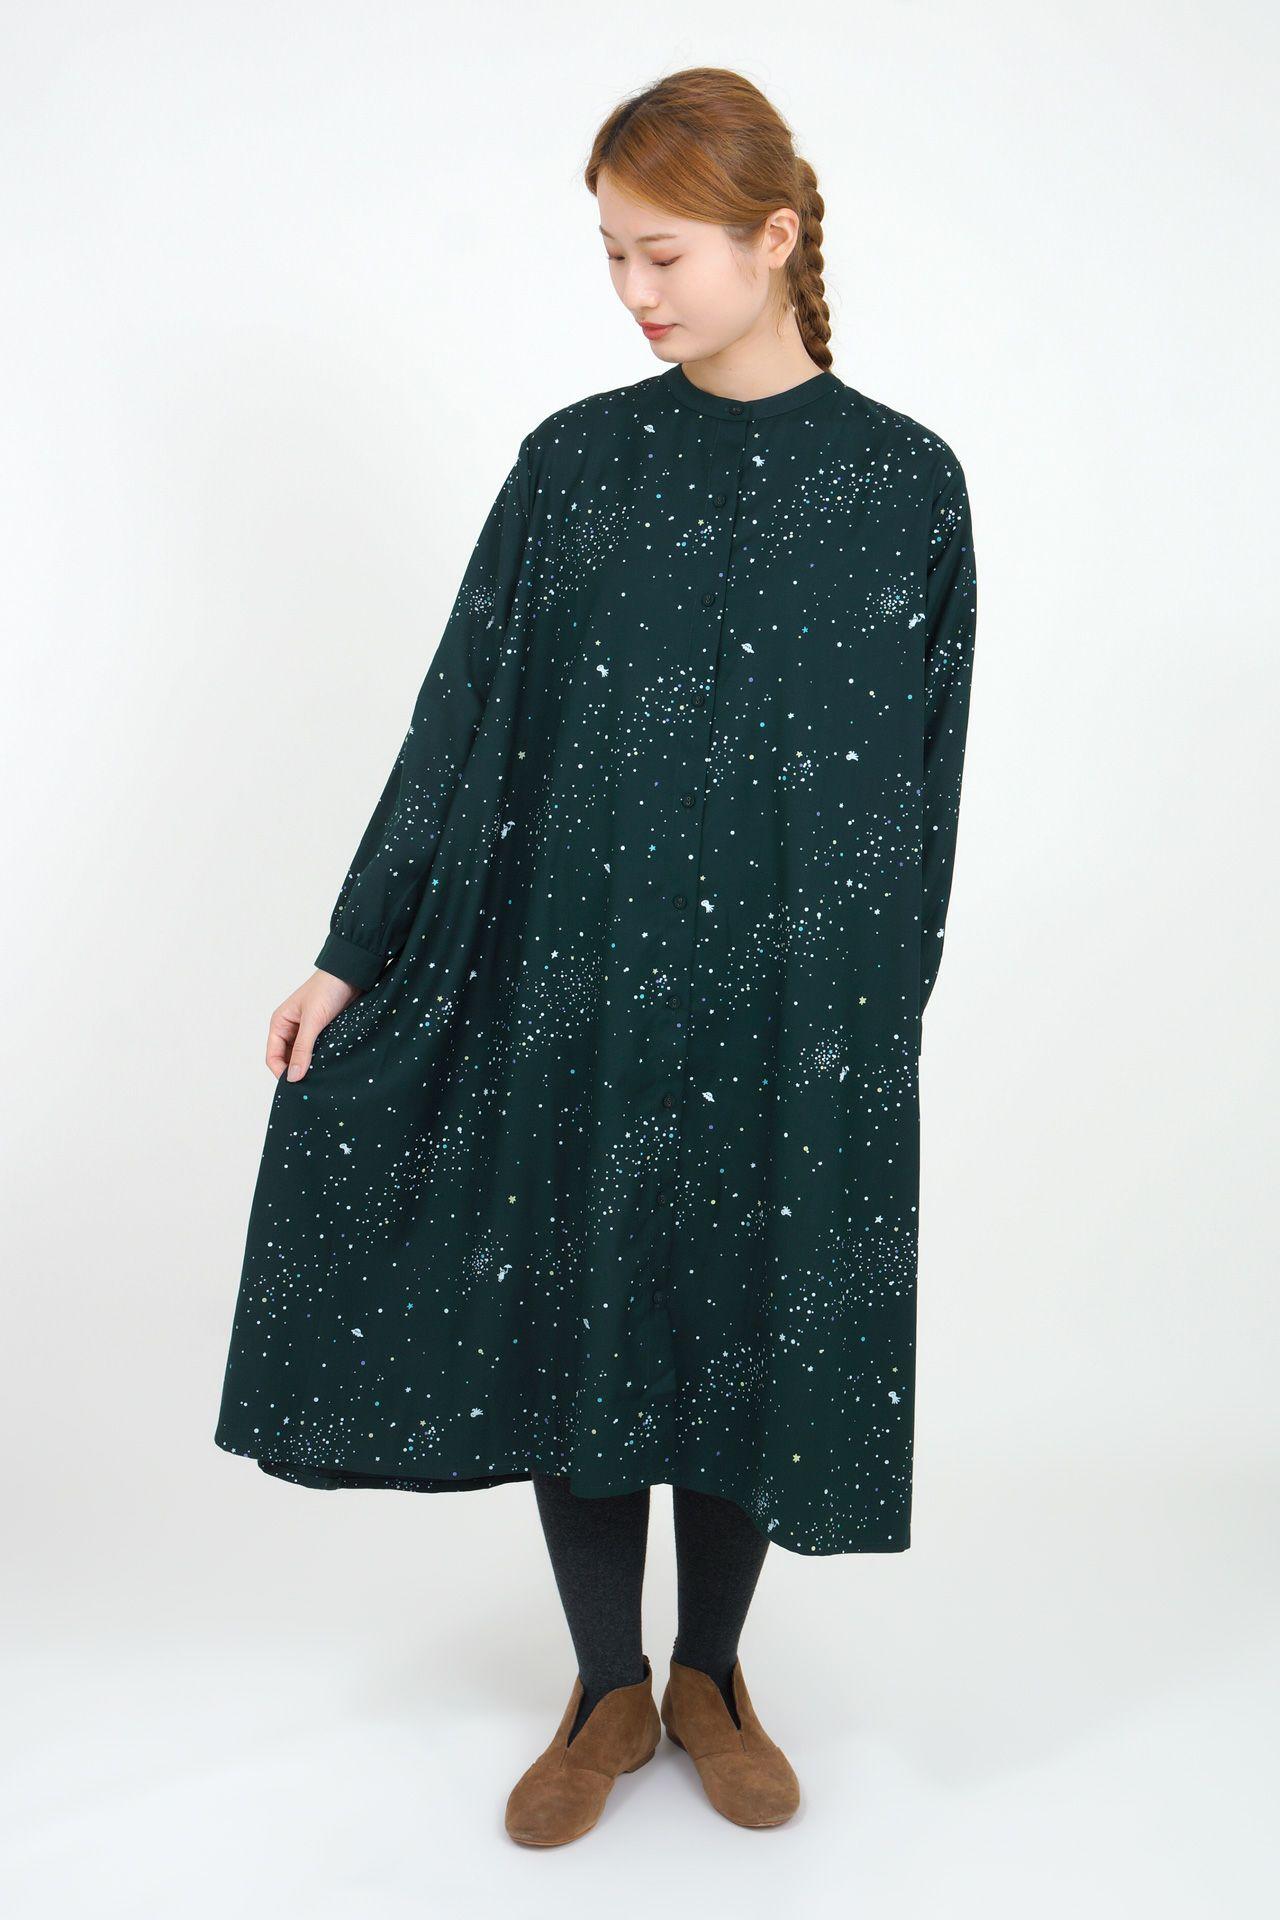 GREEN/model:165cm